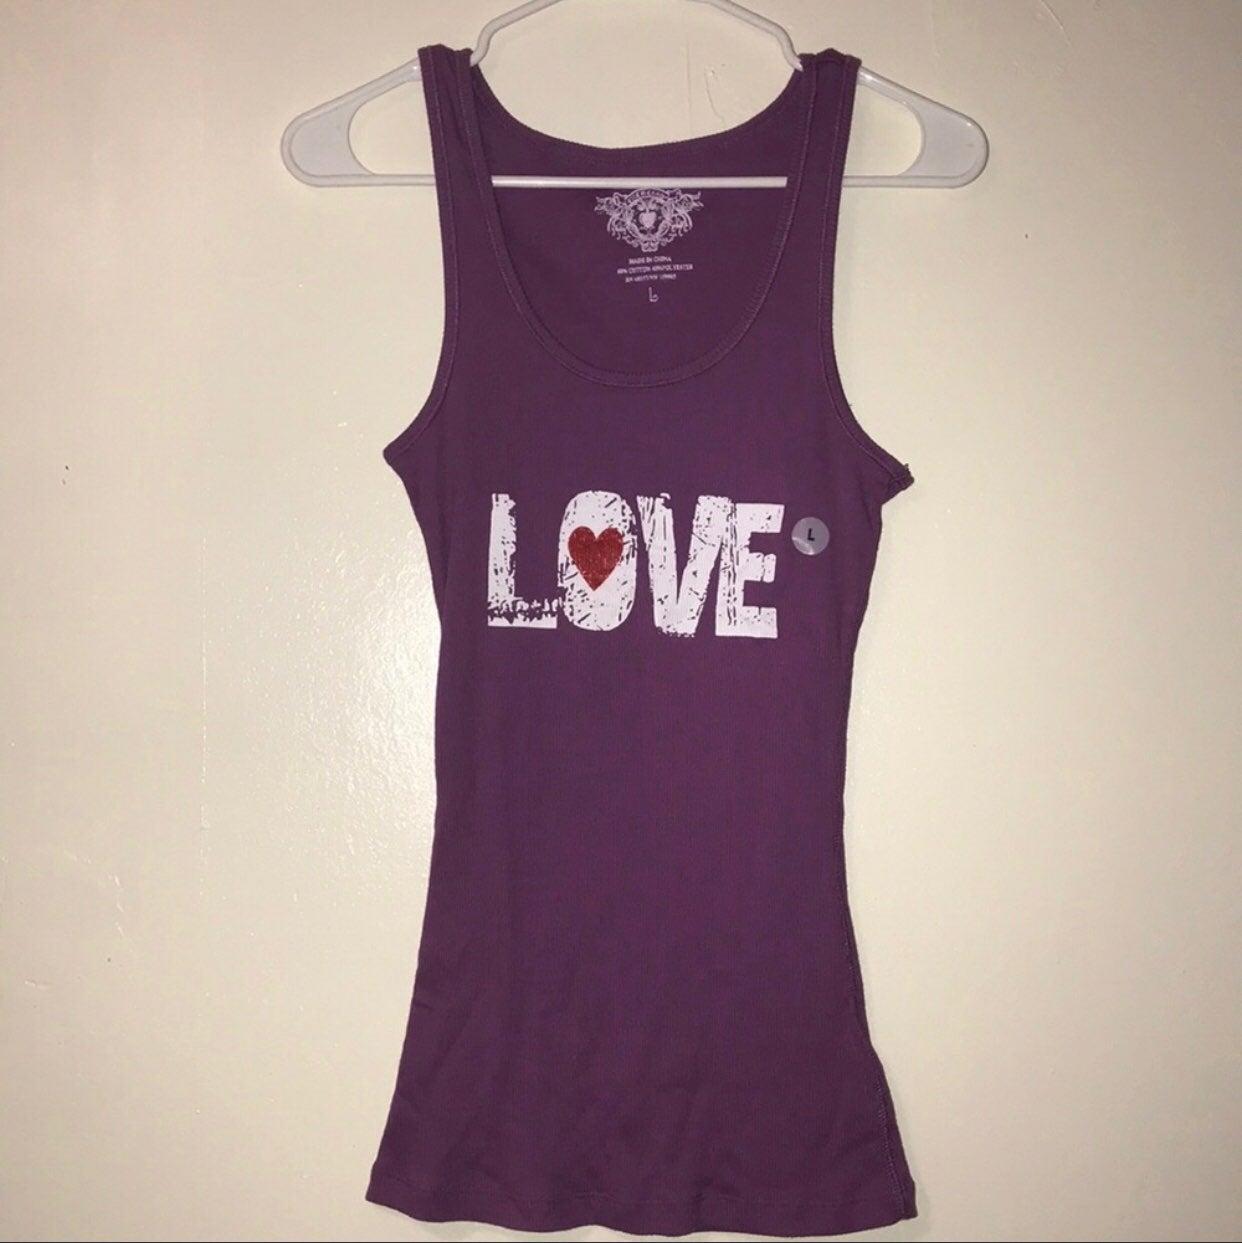 Ellemenno purple 'LOVE' ribbed tank top